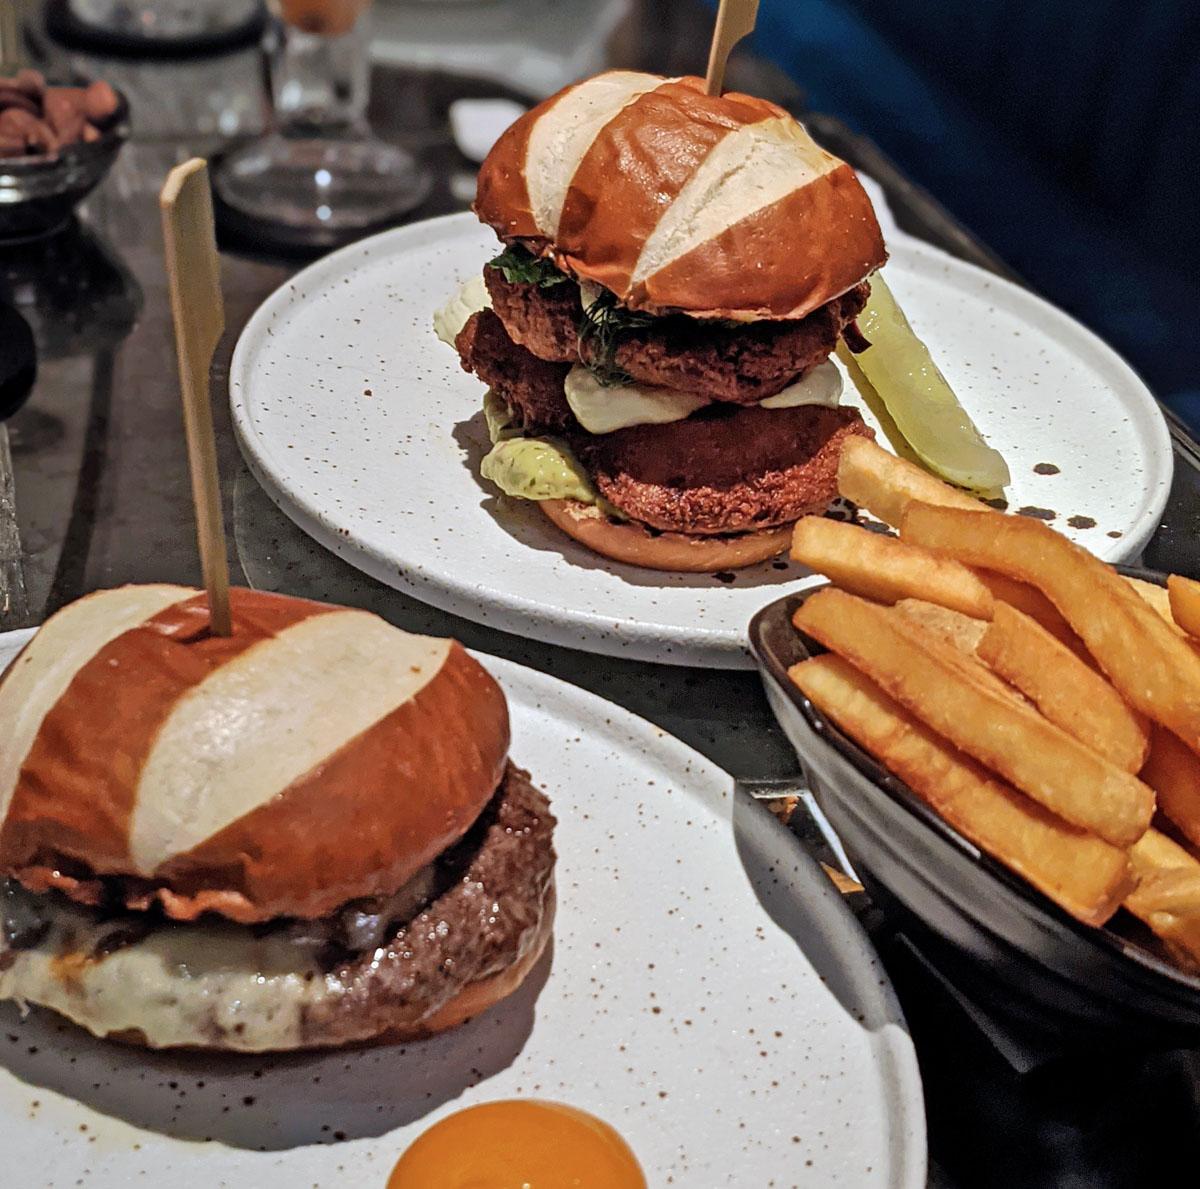 Burgers at the Churchill bar